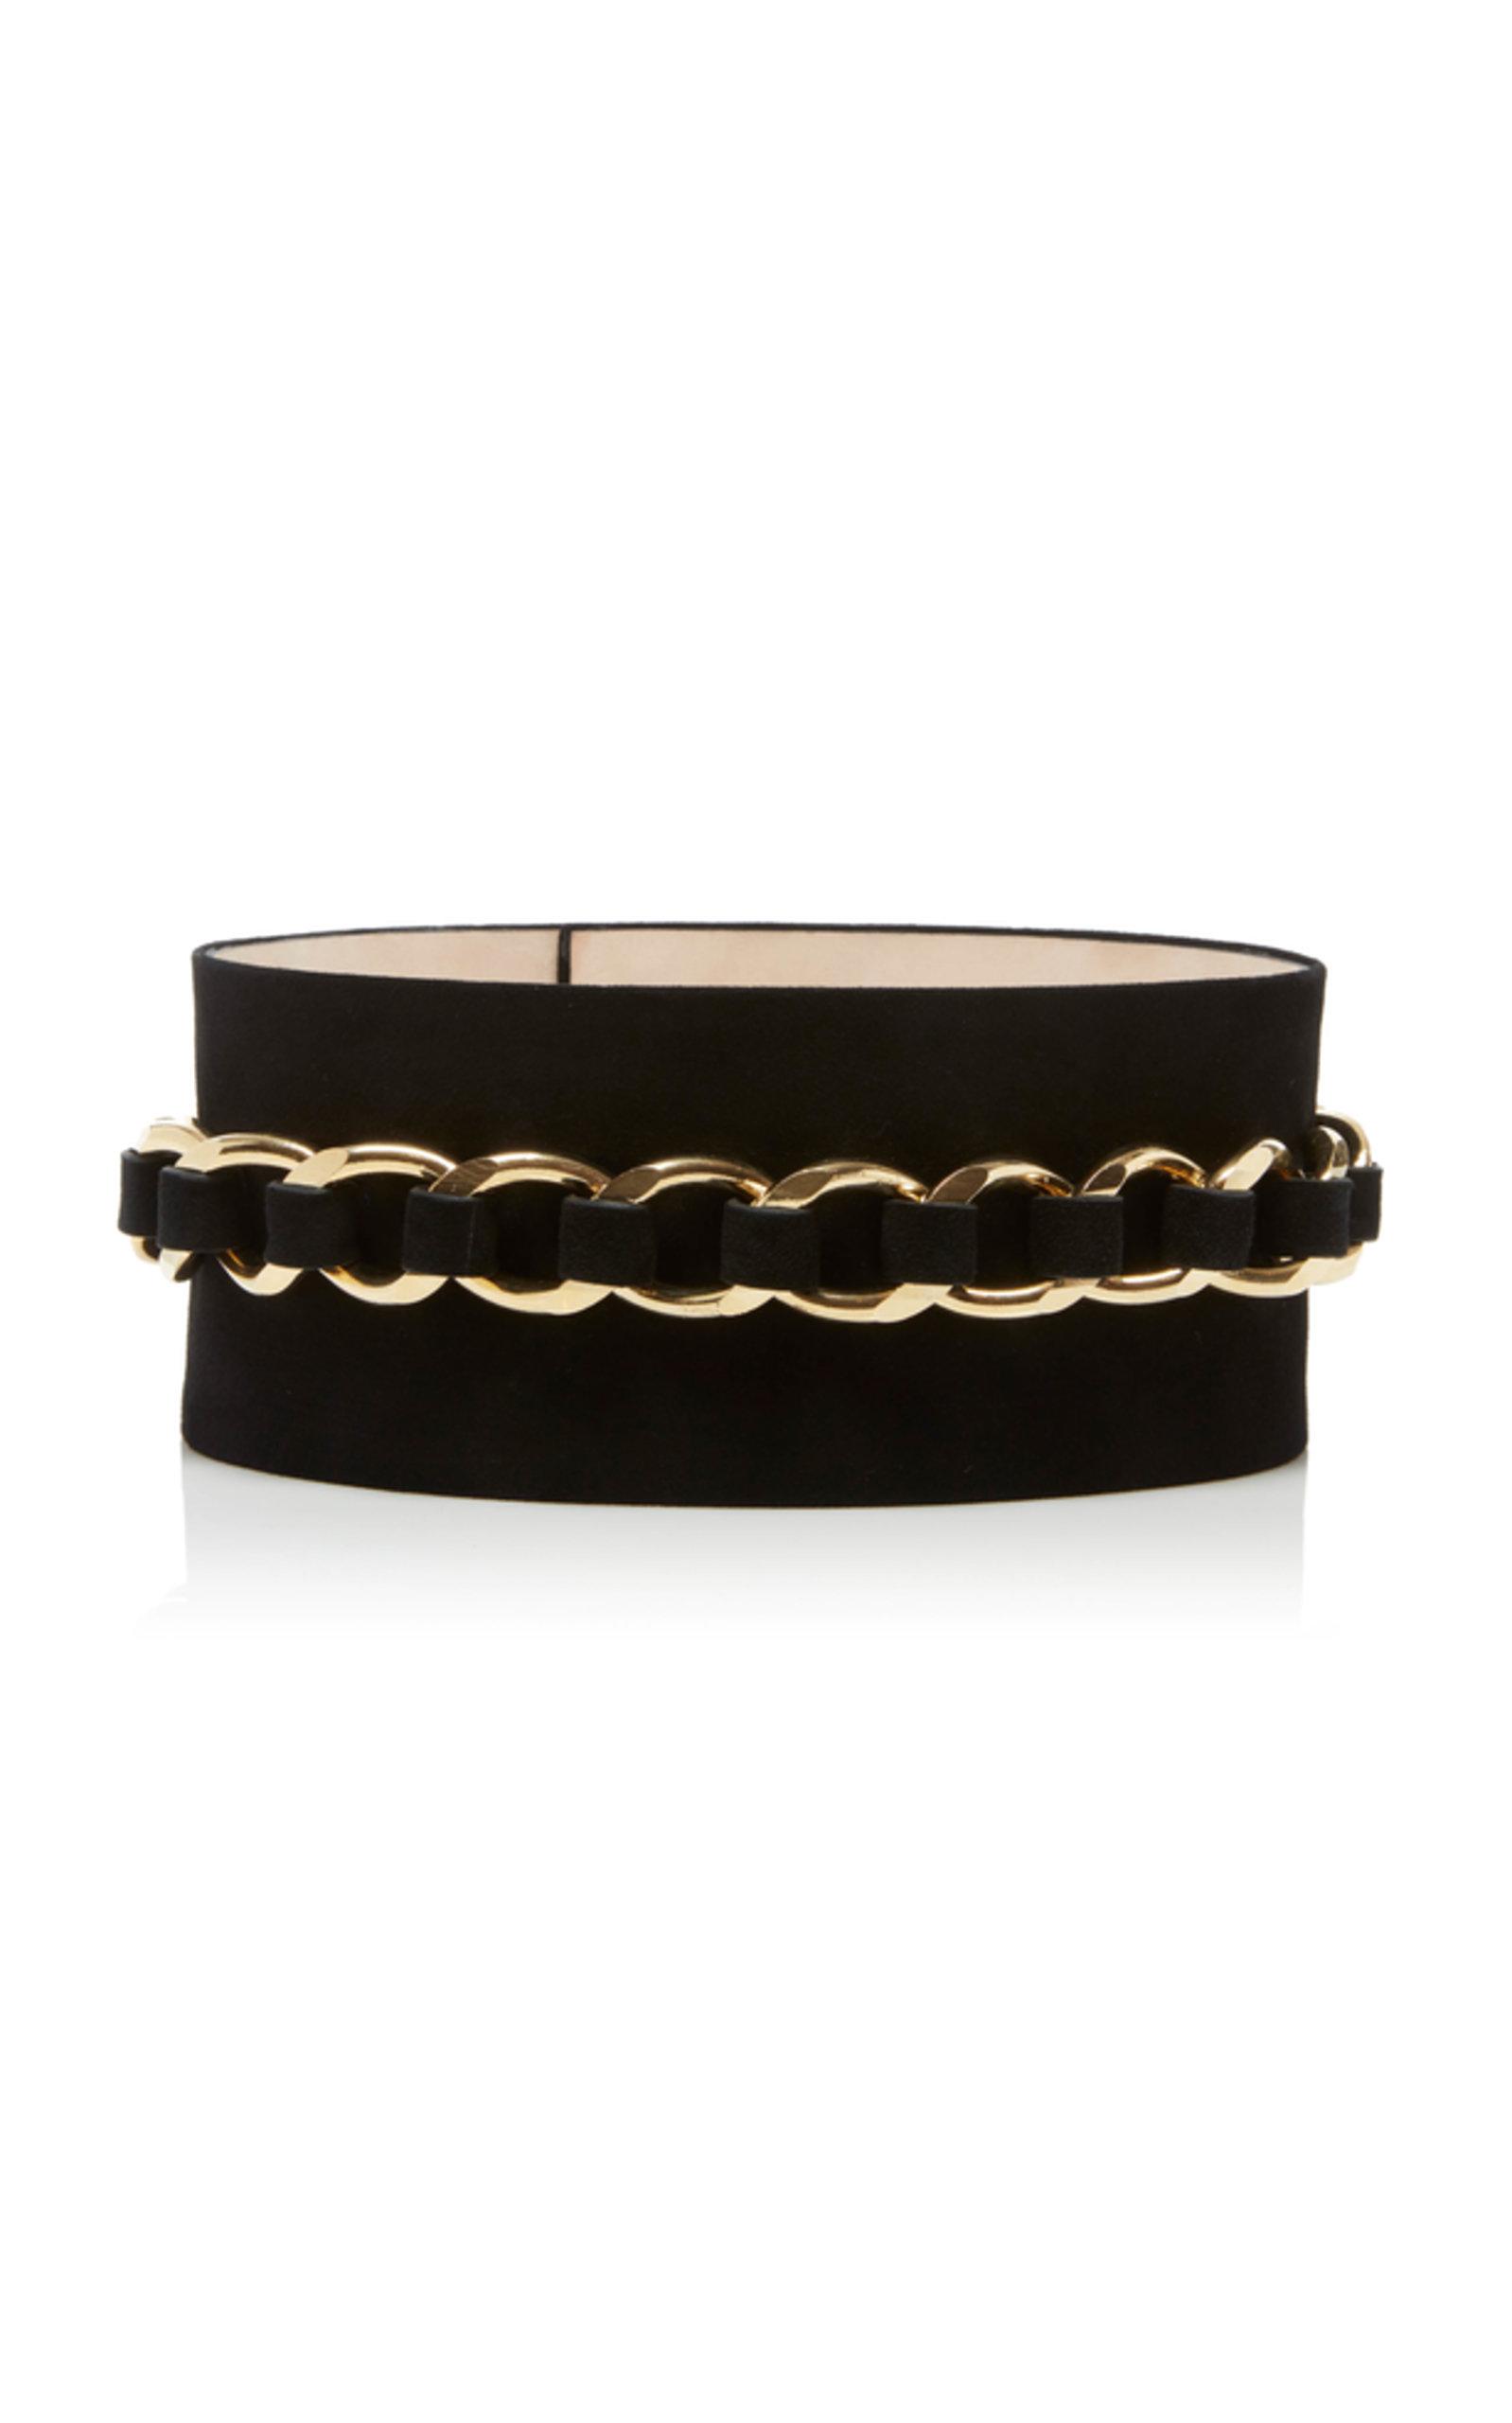 1caa7c2772 High Waist Large Chain Belt-Suede Leather by Balmain   Moda Operandi